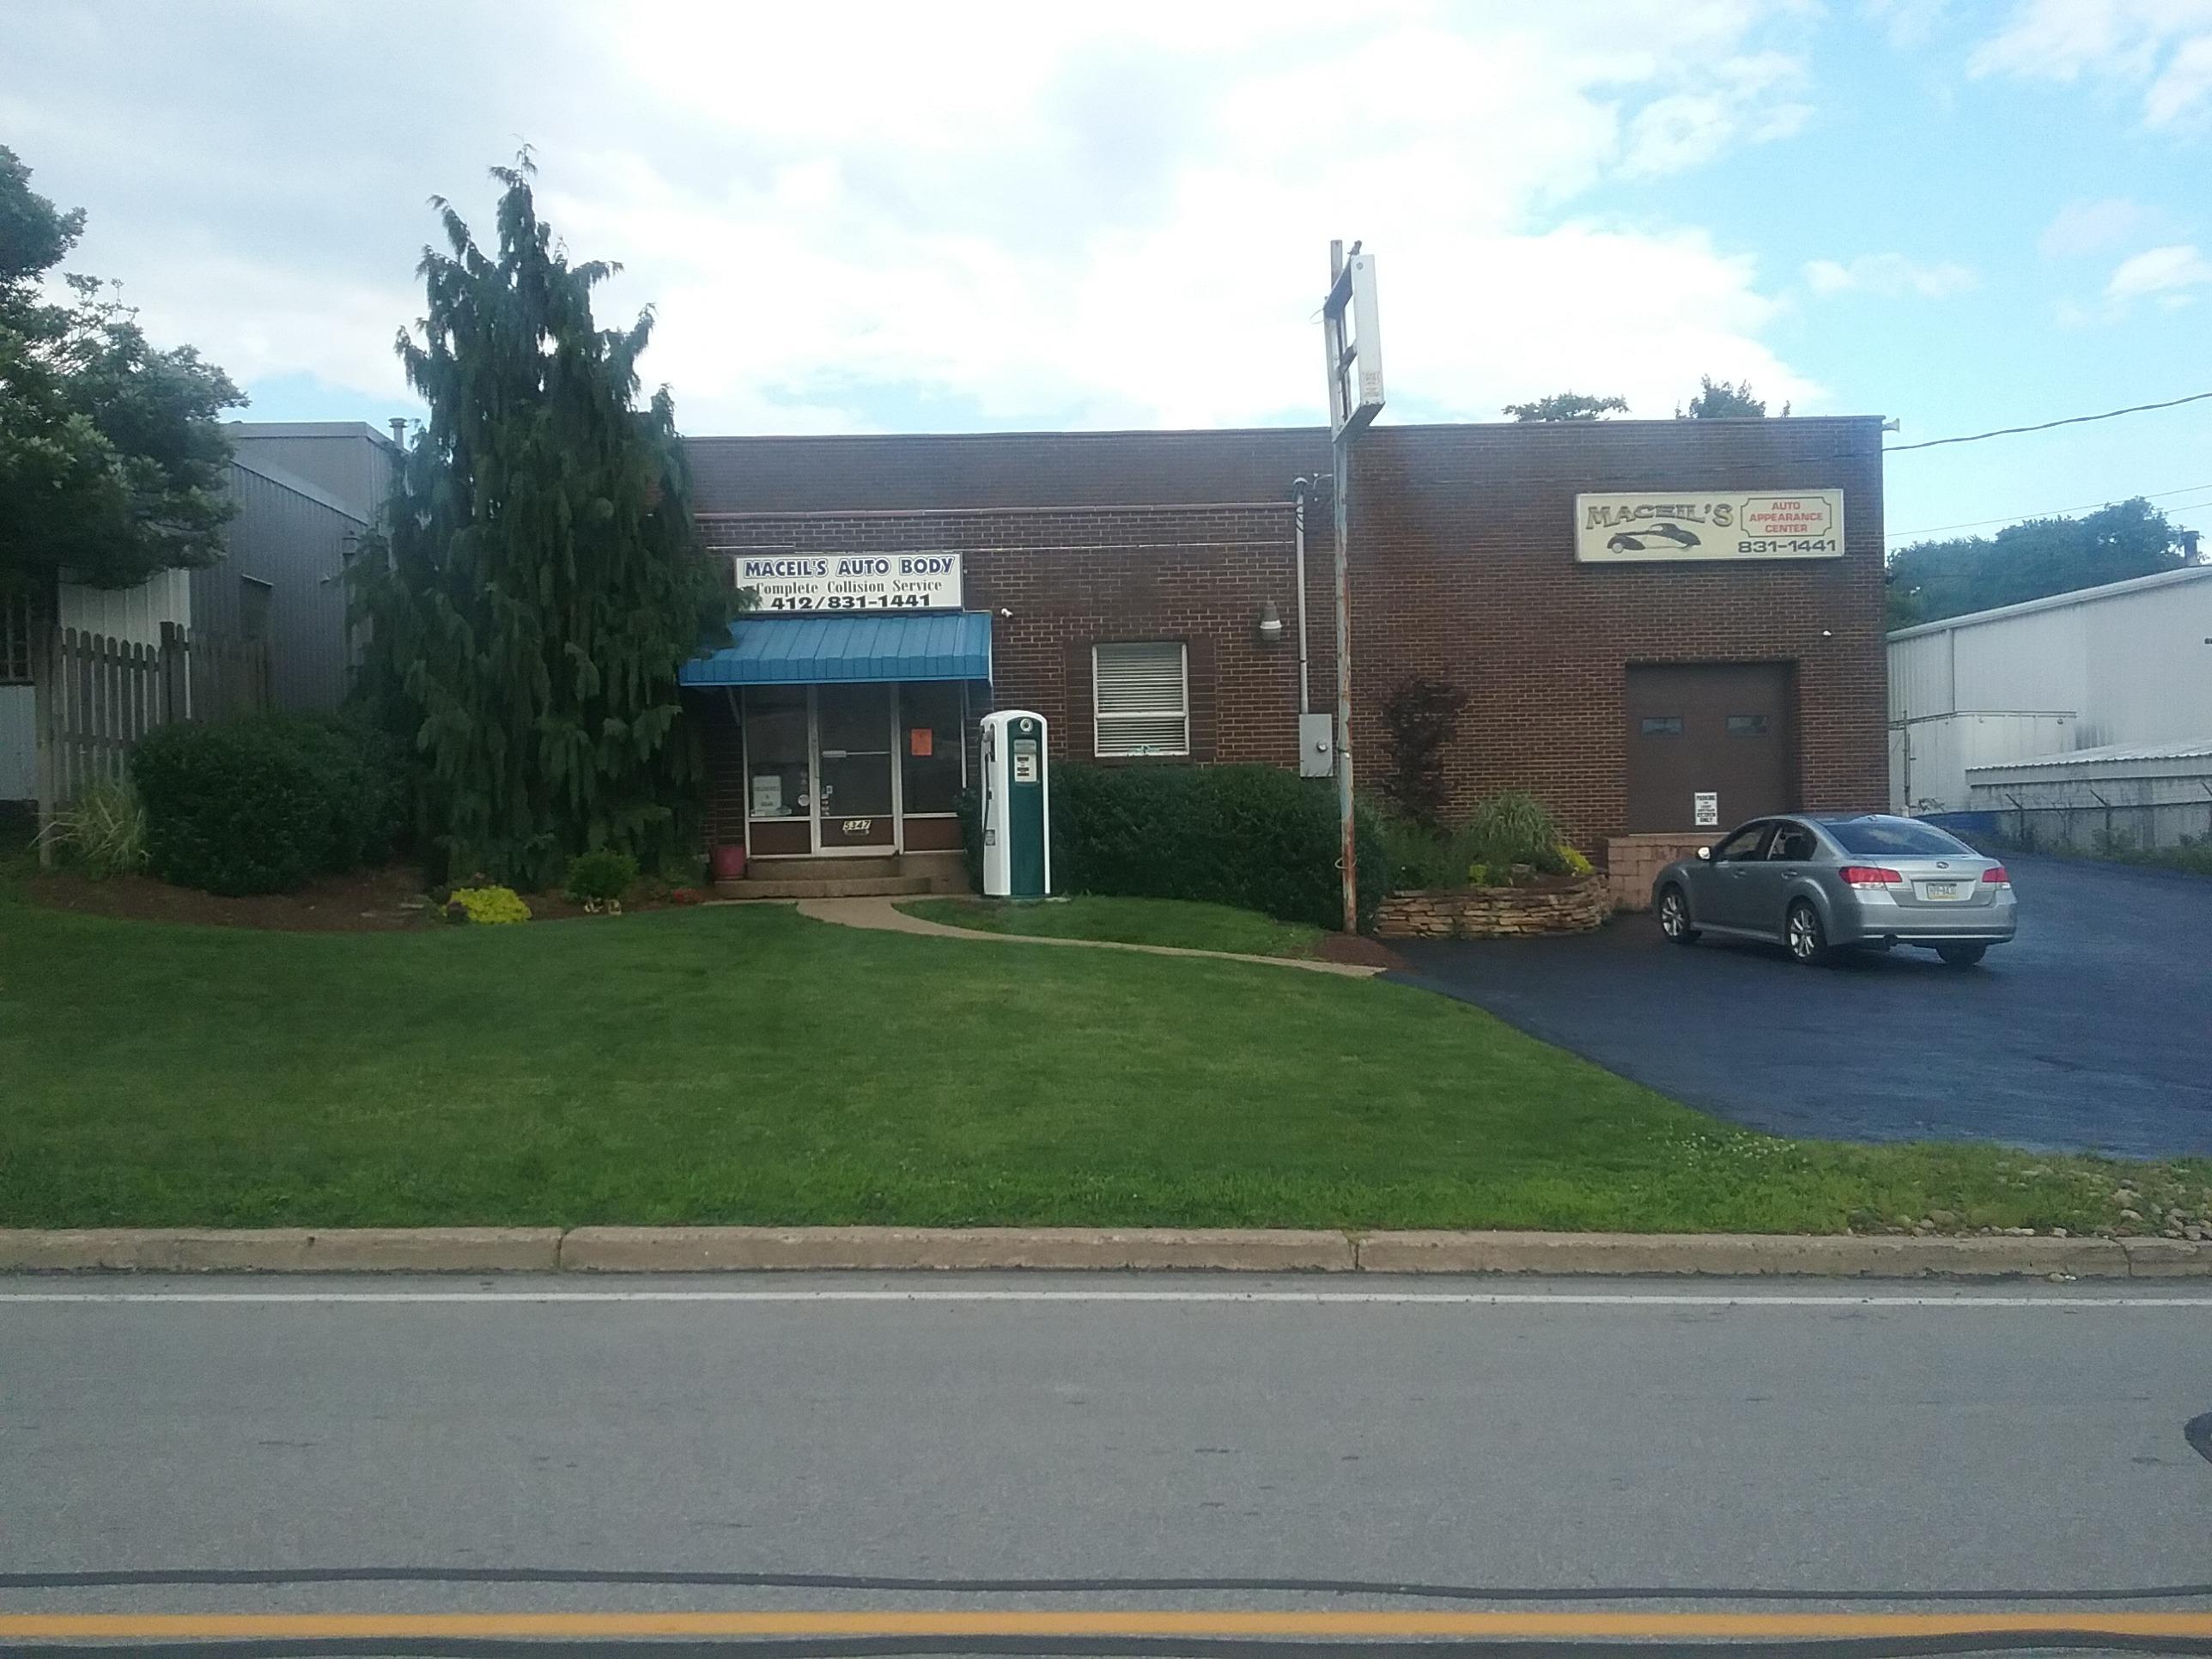 Maceil's Auto Body storefront.